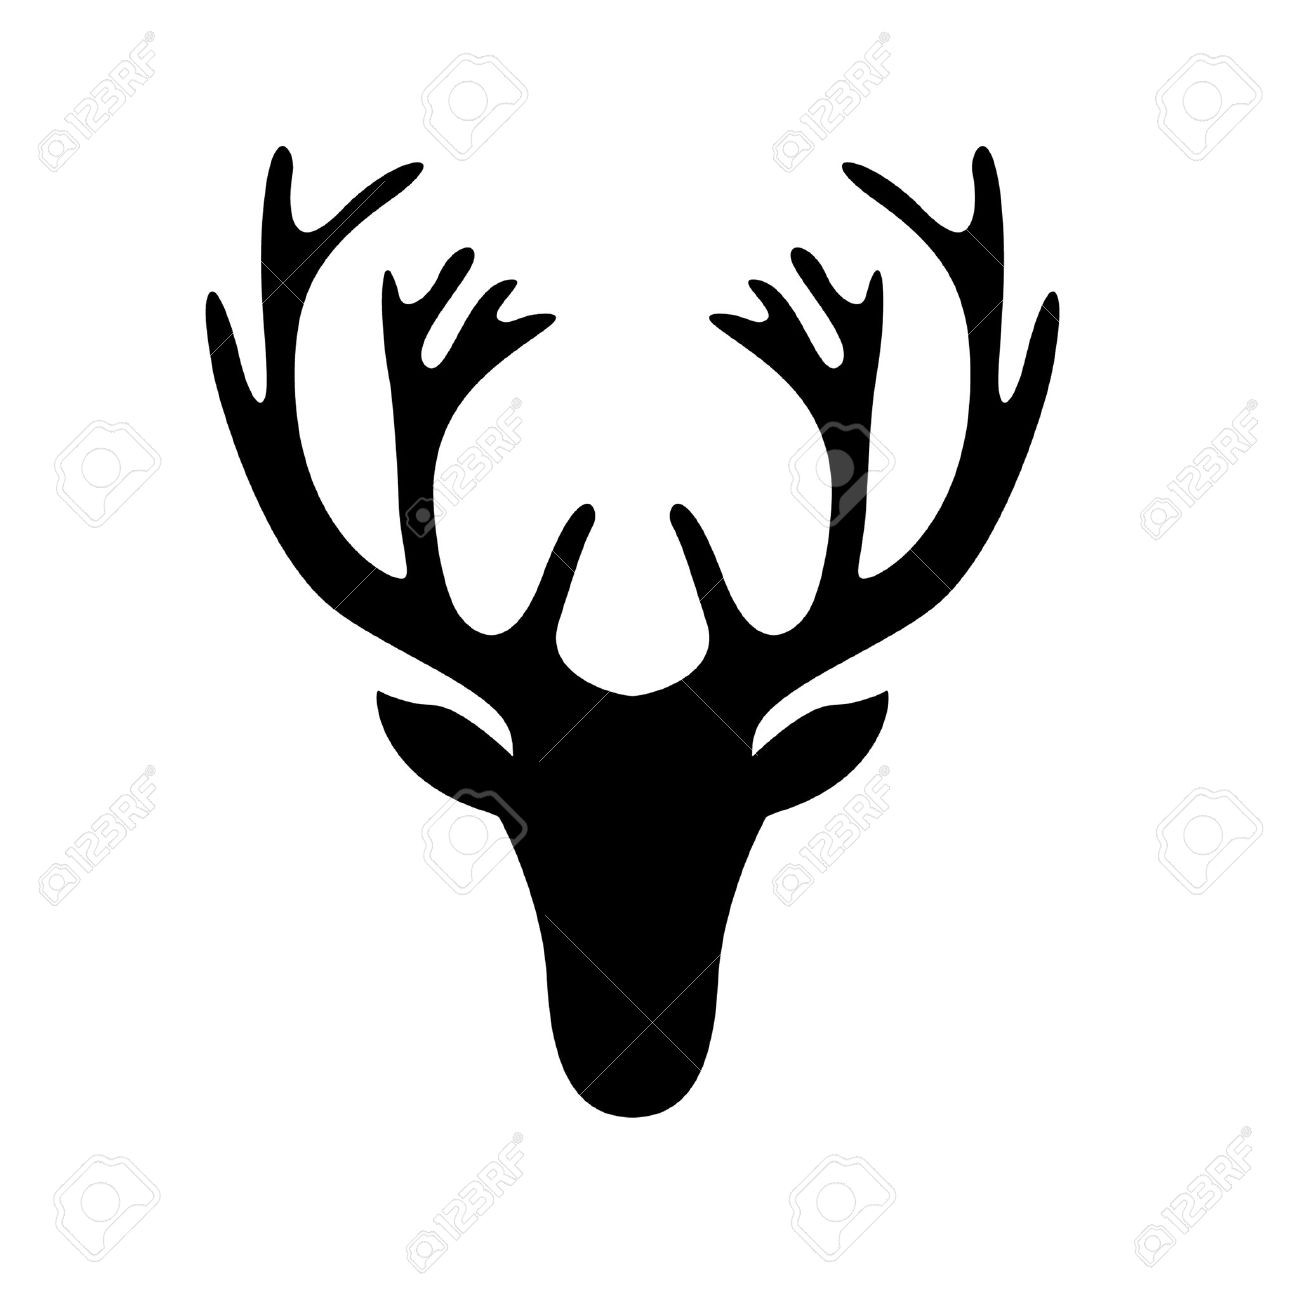 1300x1300 Black Silhouette Of Deer Antlers Stock Vector Art 827623316 Istock